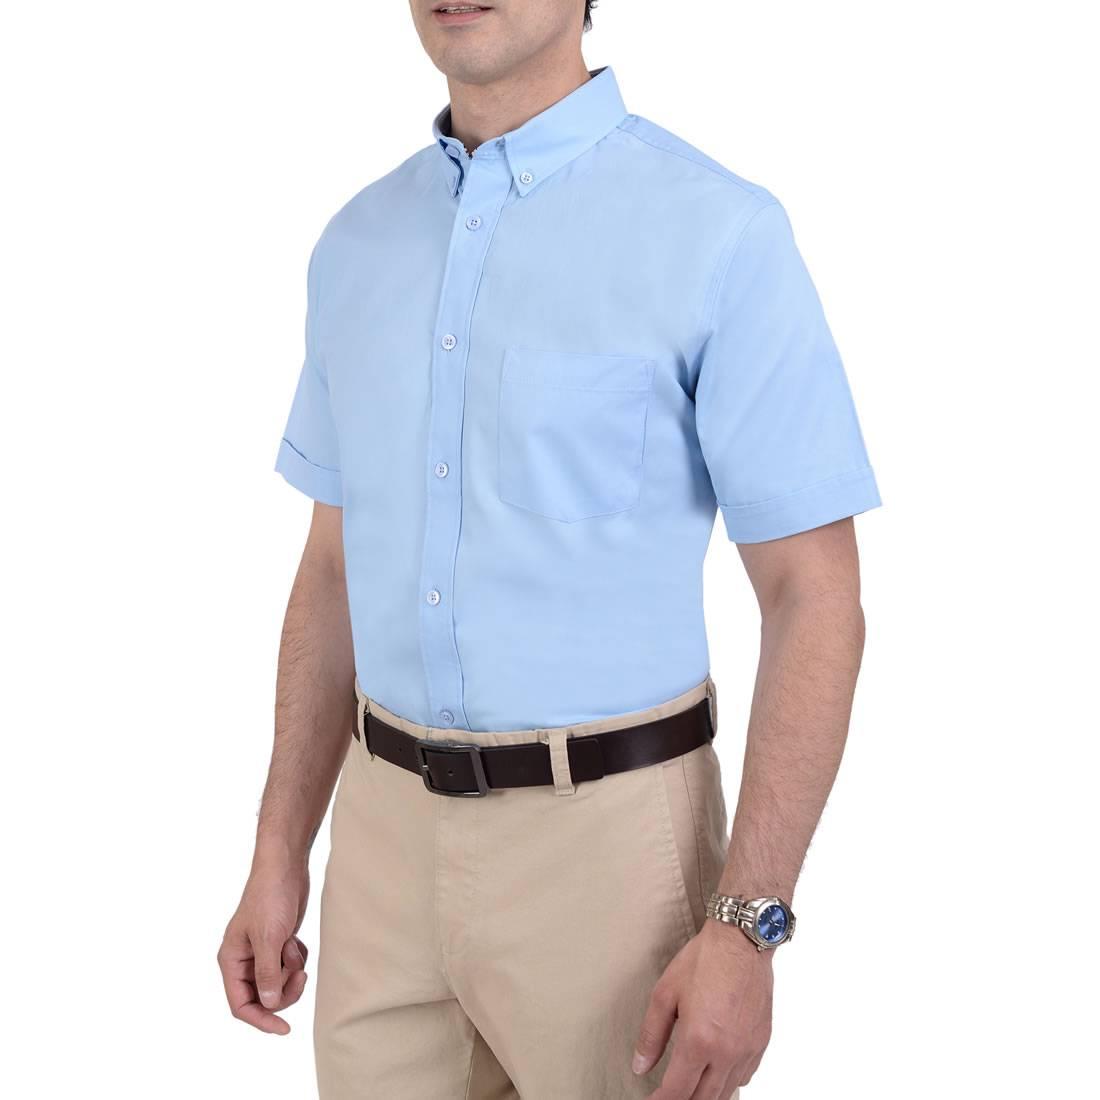 042331381711-02-Camisa-Manga-Corta-classic-Fit-Azul-Cielo-yale